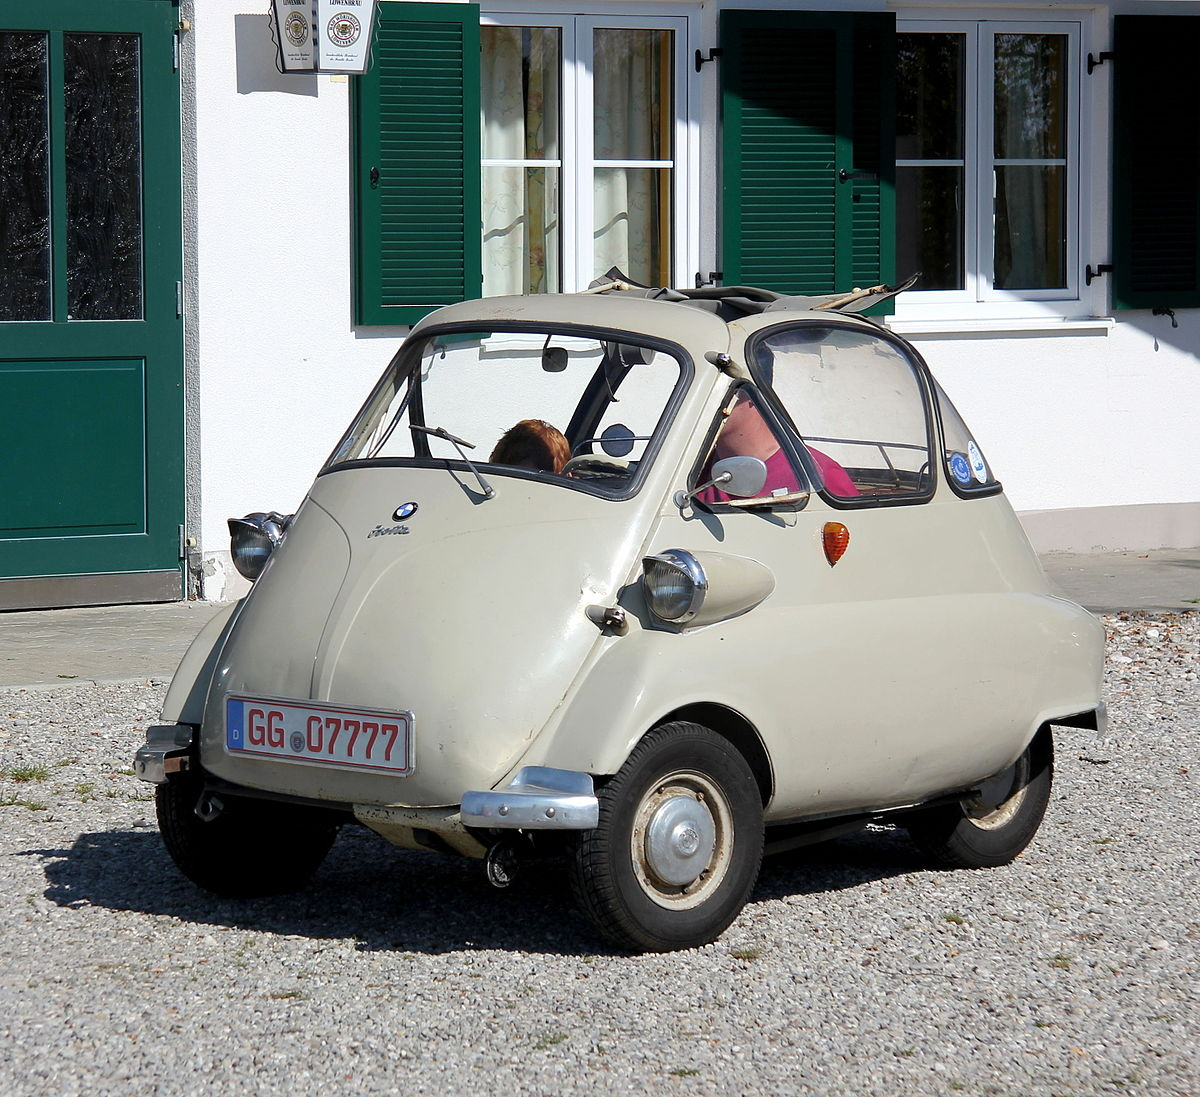 Heinkel Bubble Cars For Sale Uk